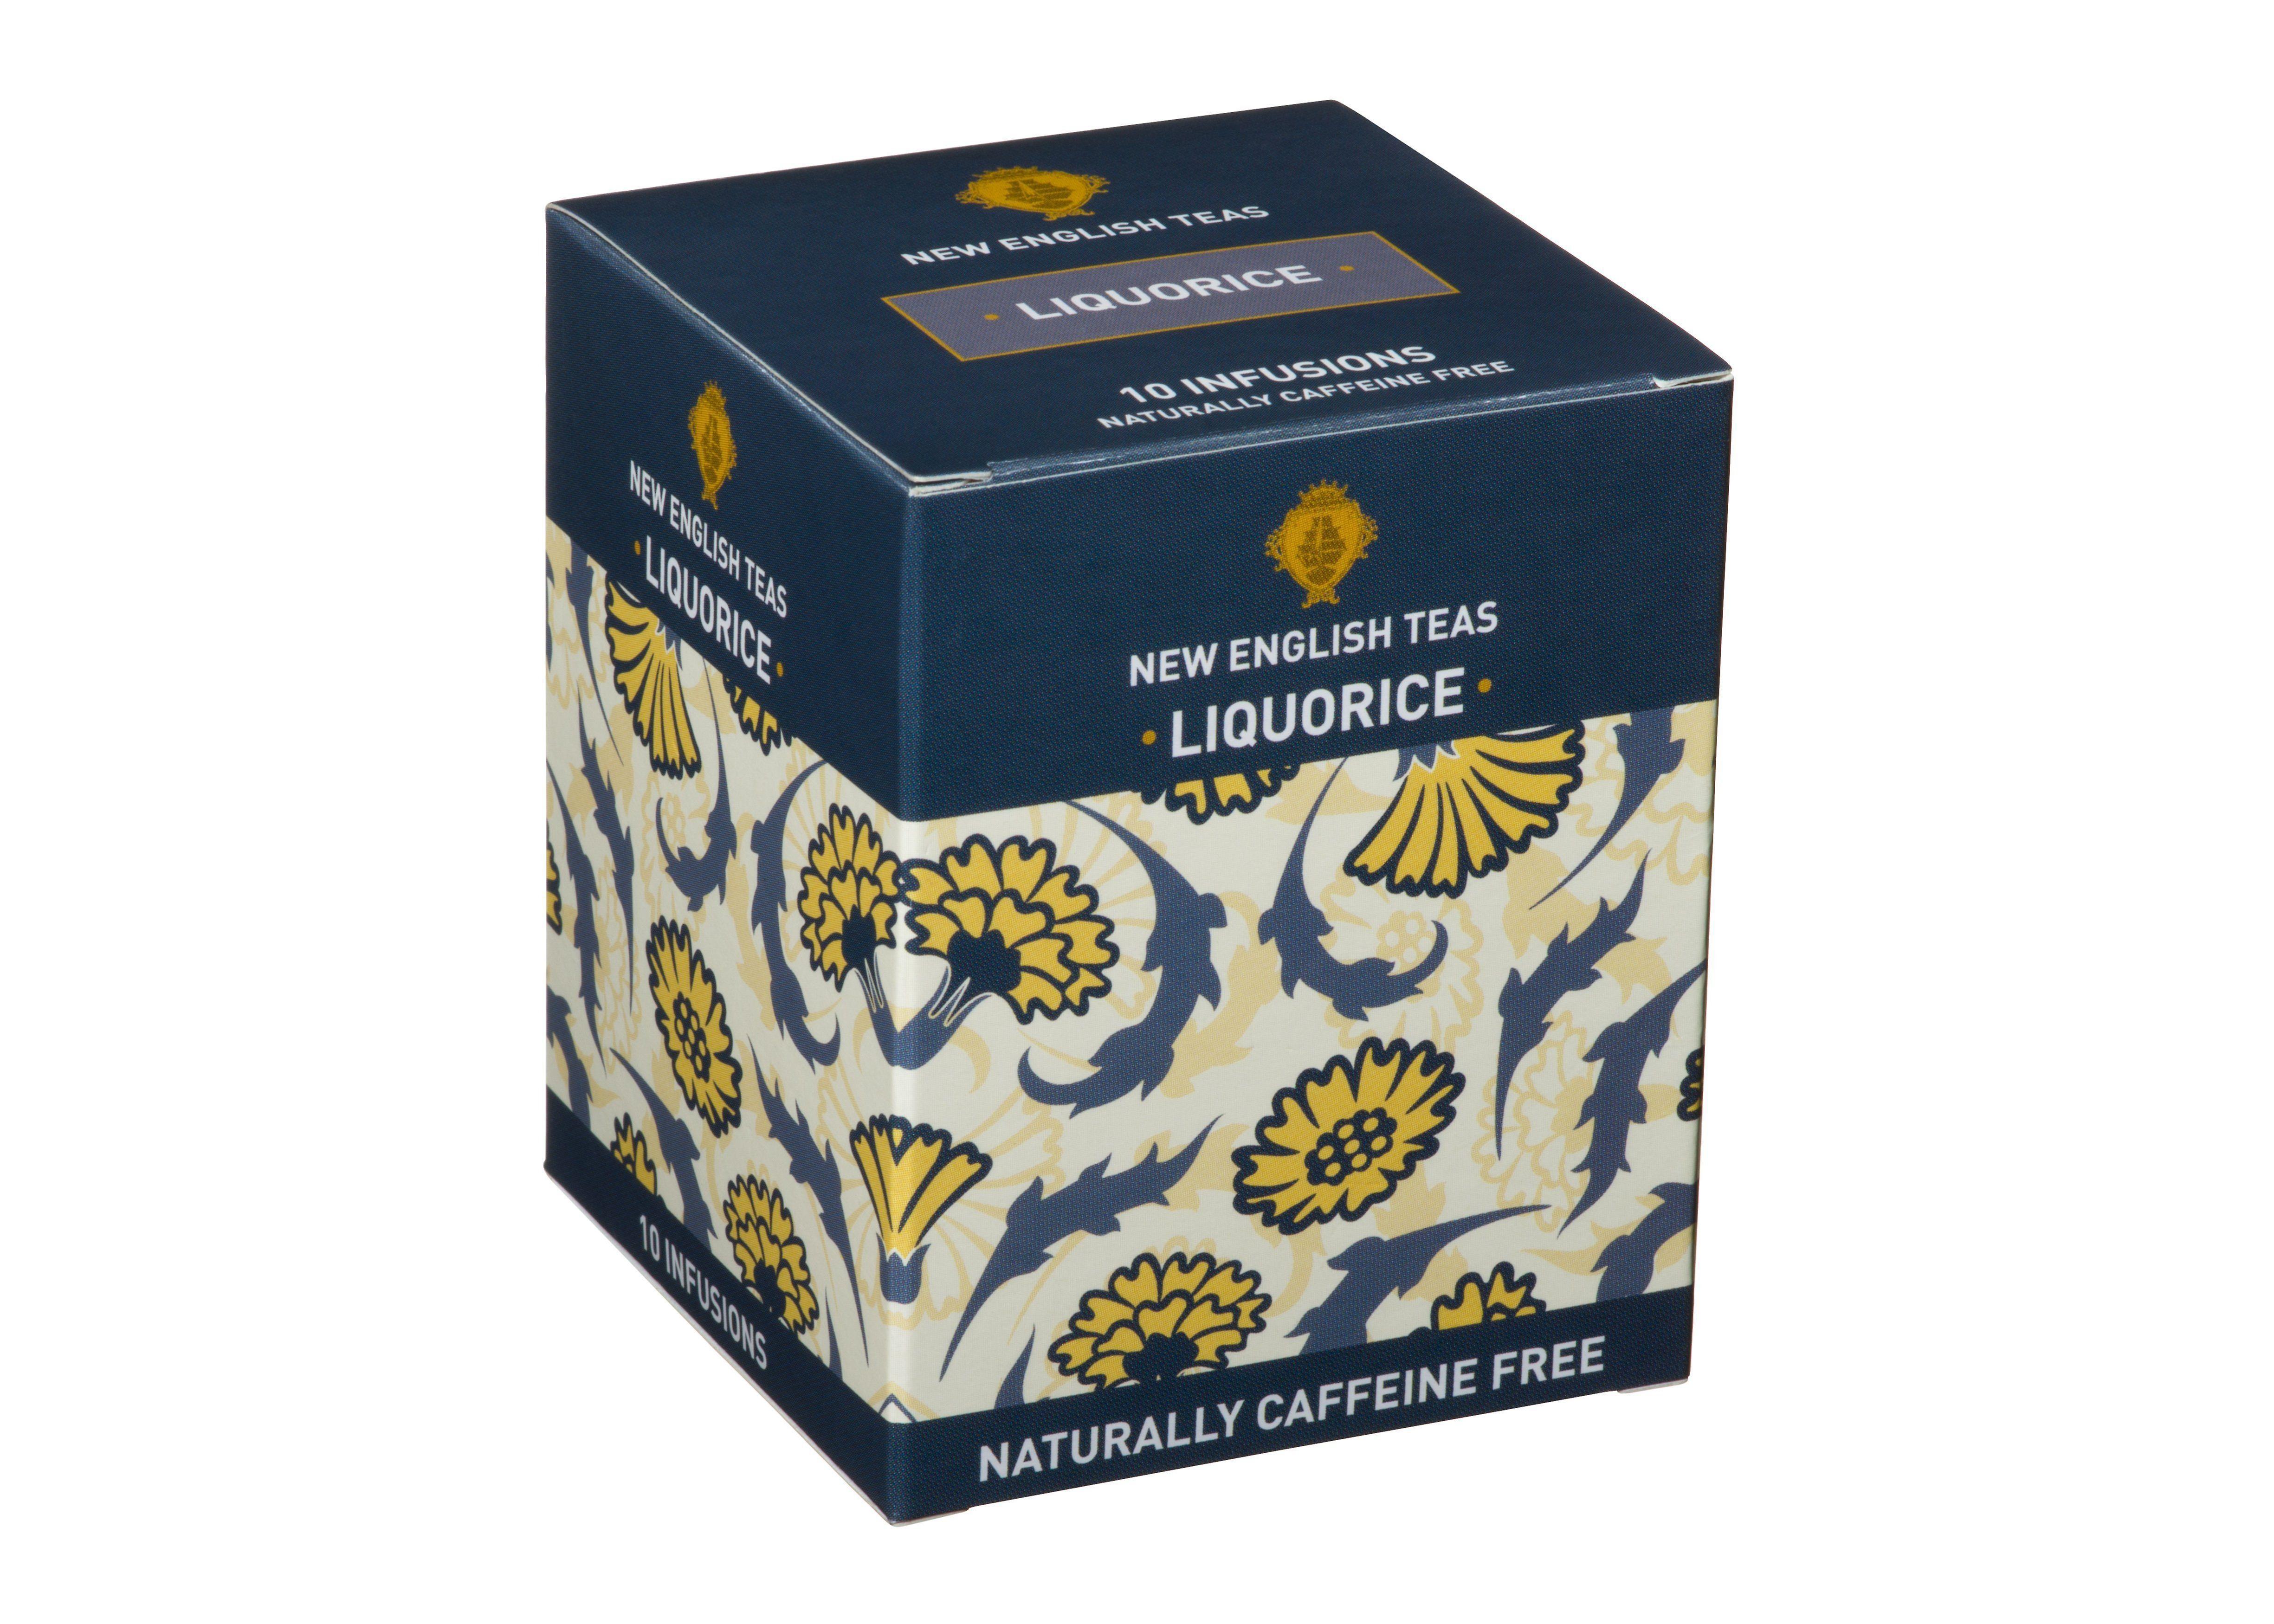 Liquorice tea 10 individually wrapped teabags